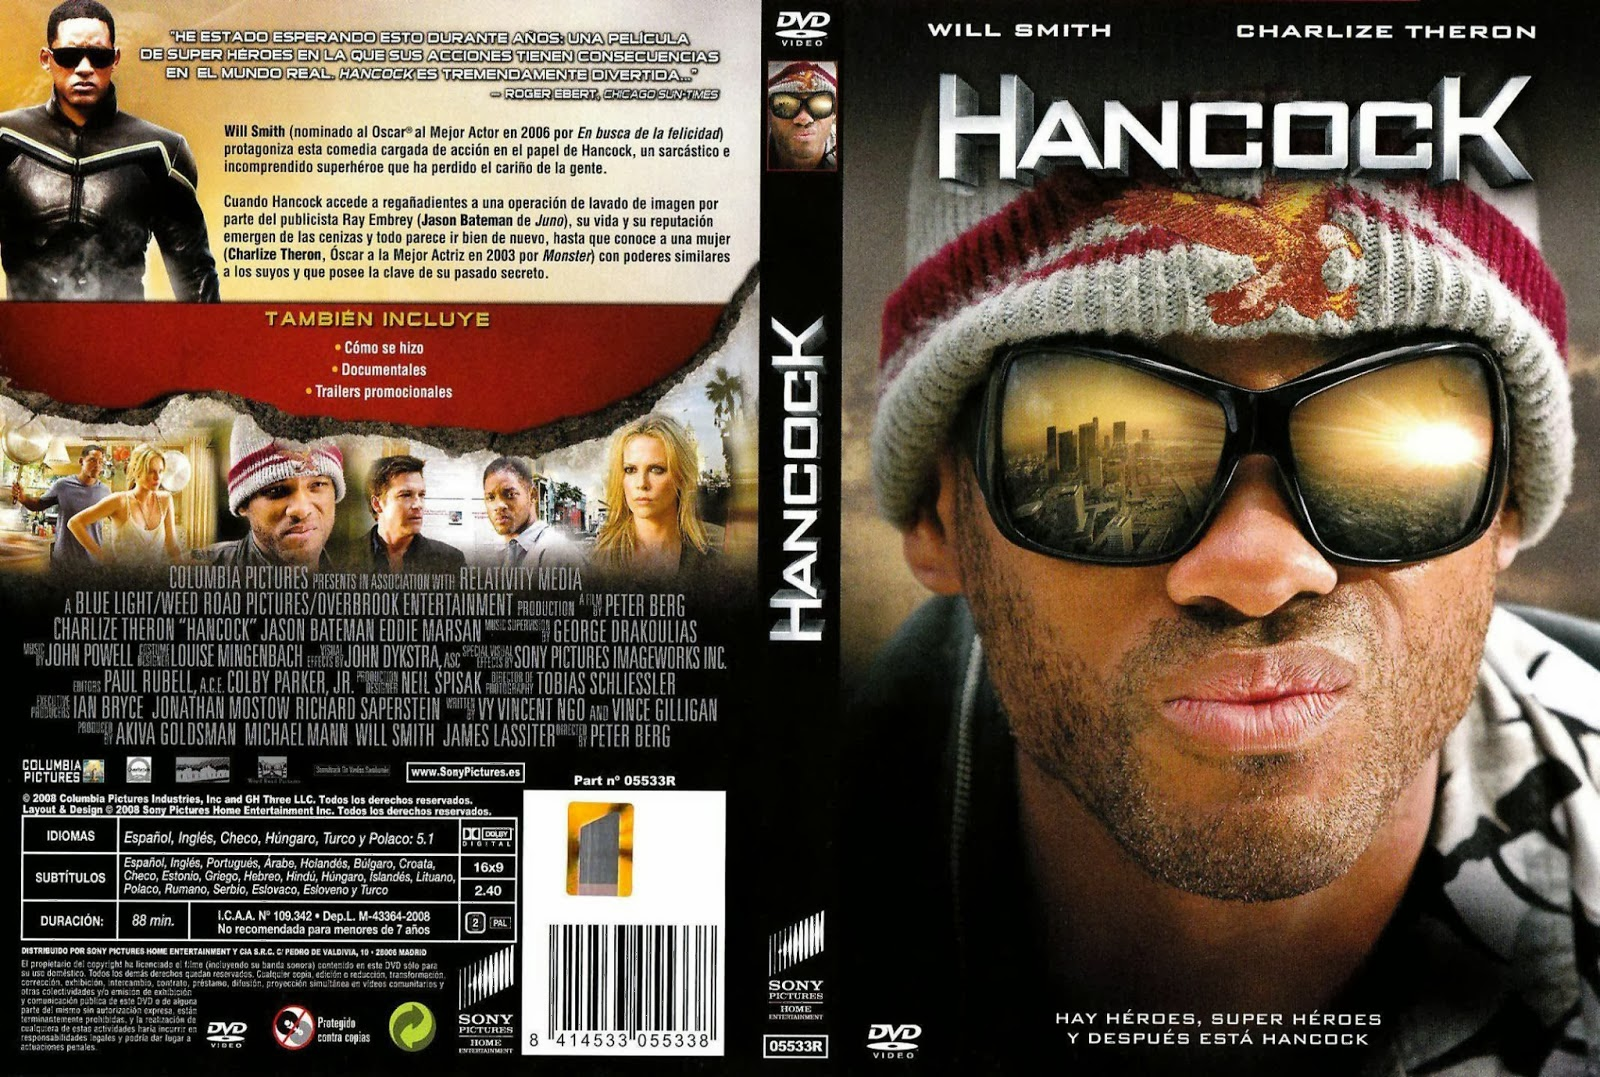 Hancock (Version Extendida) DVD